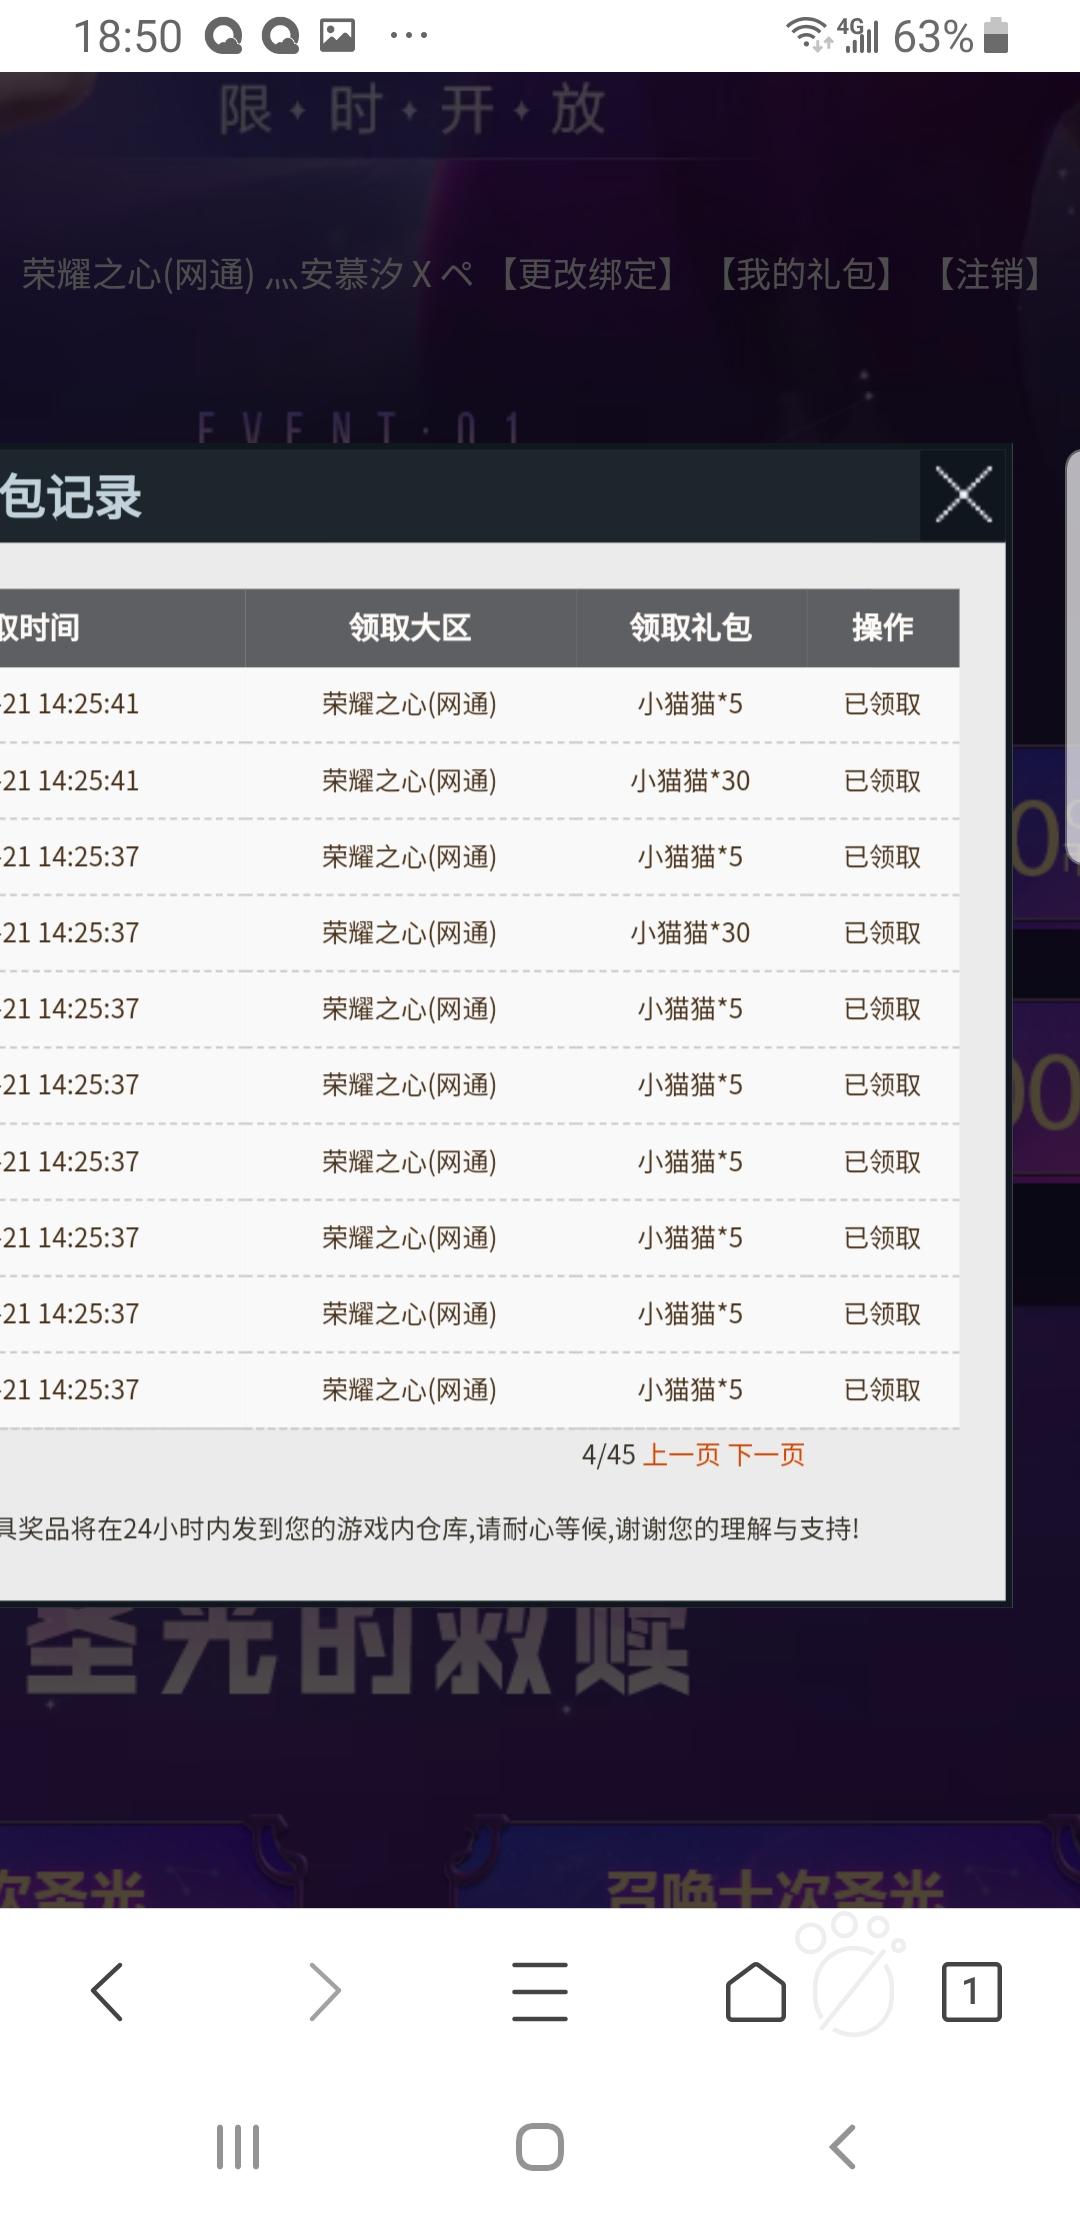 Screenshot_20210121-185052_QQ.jpg